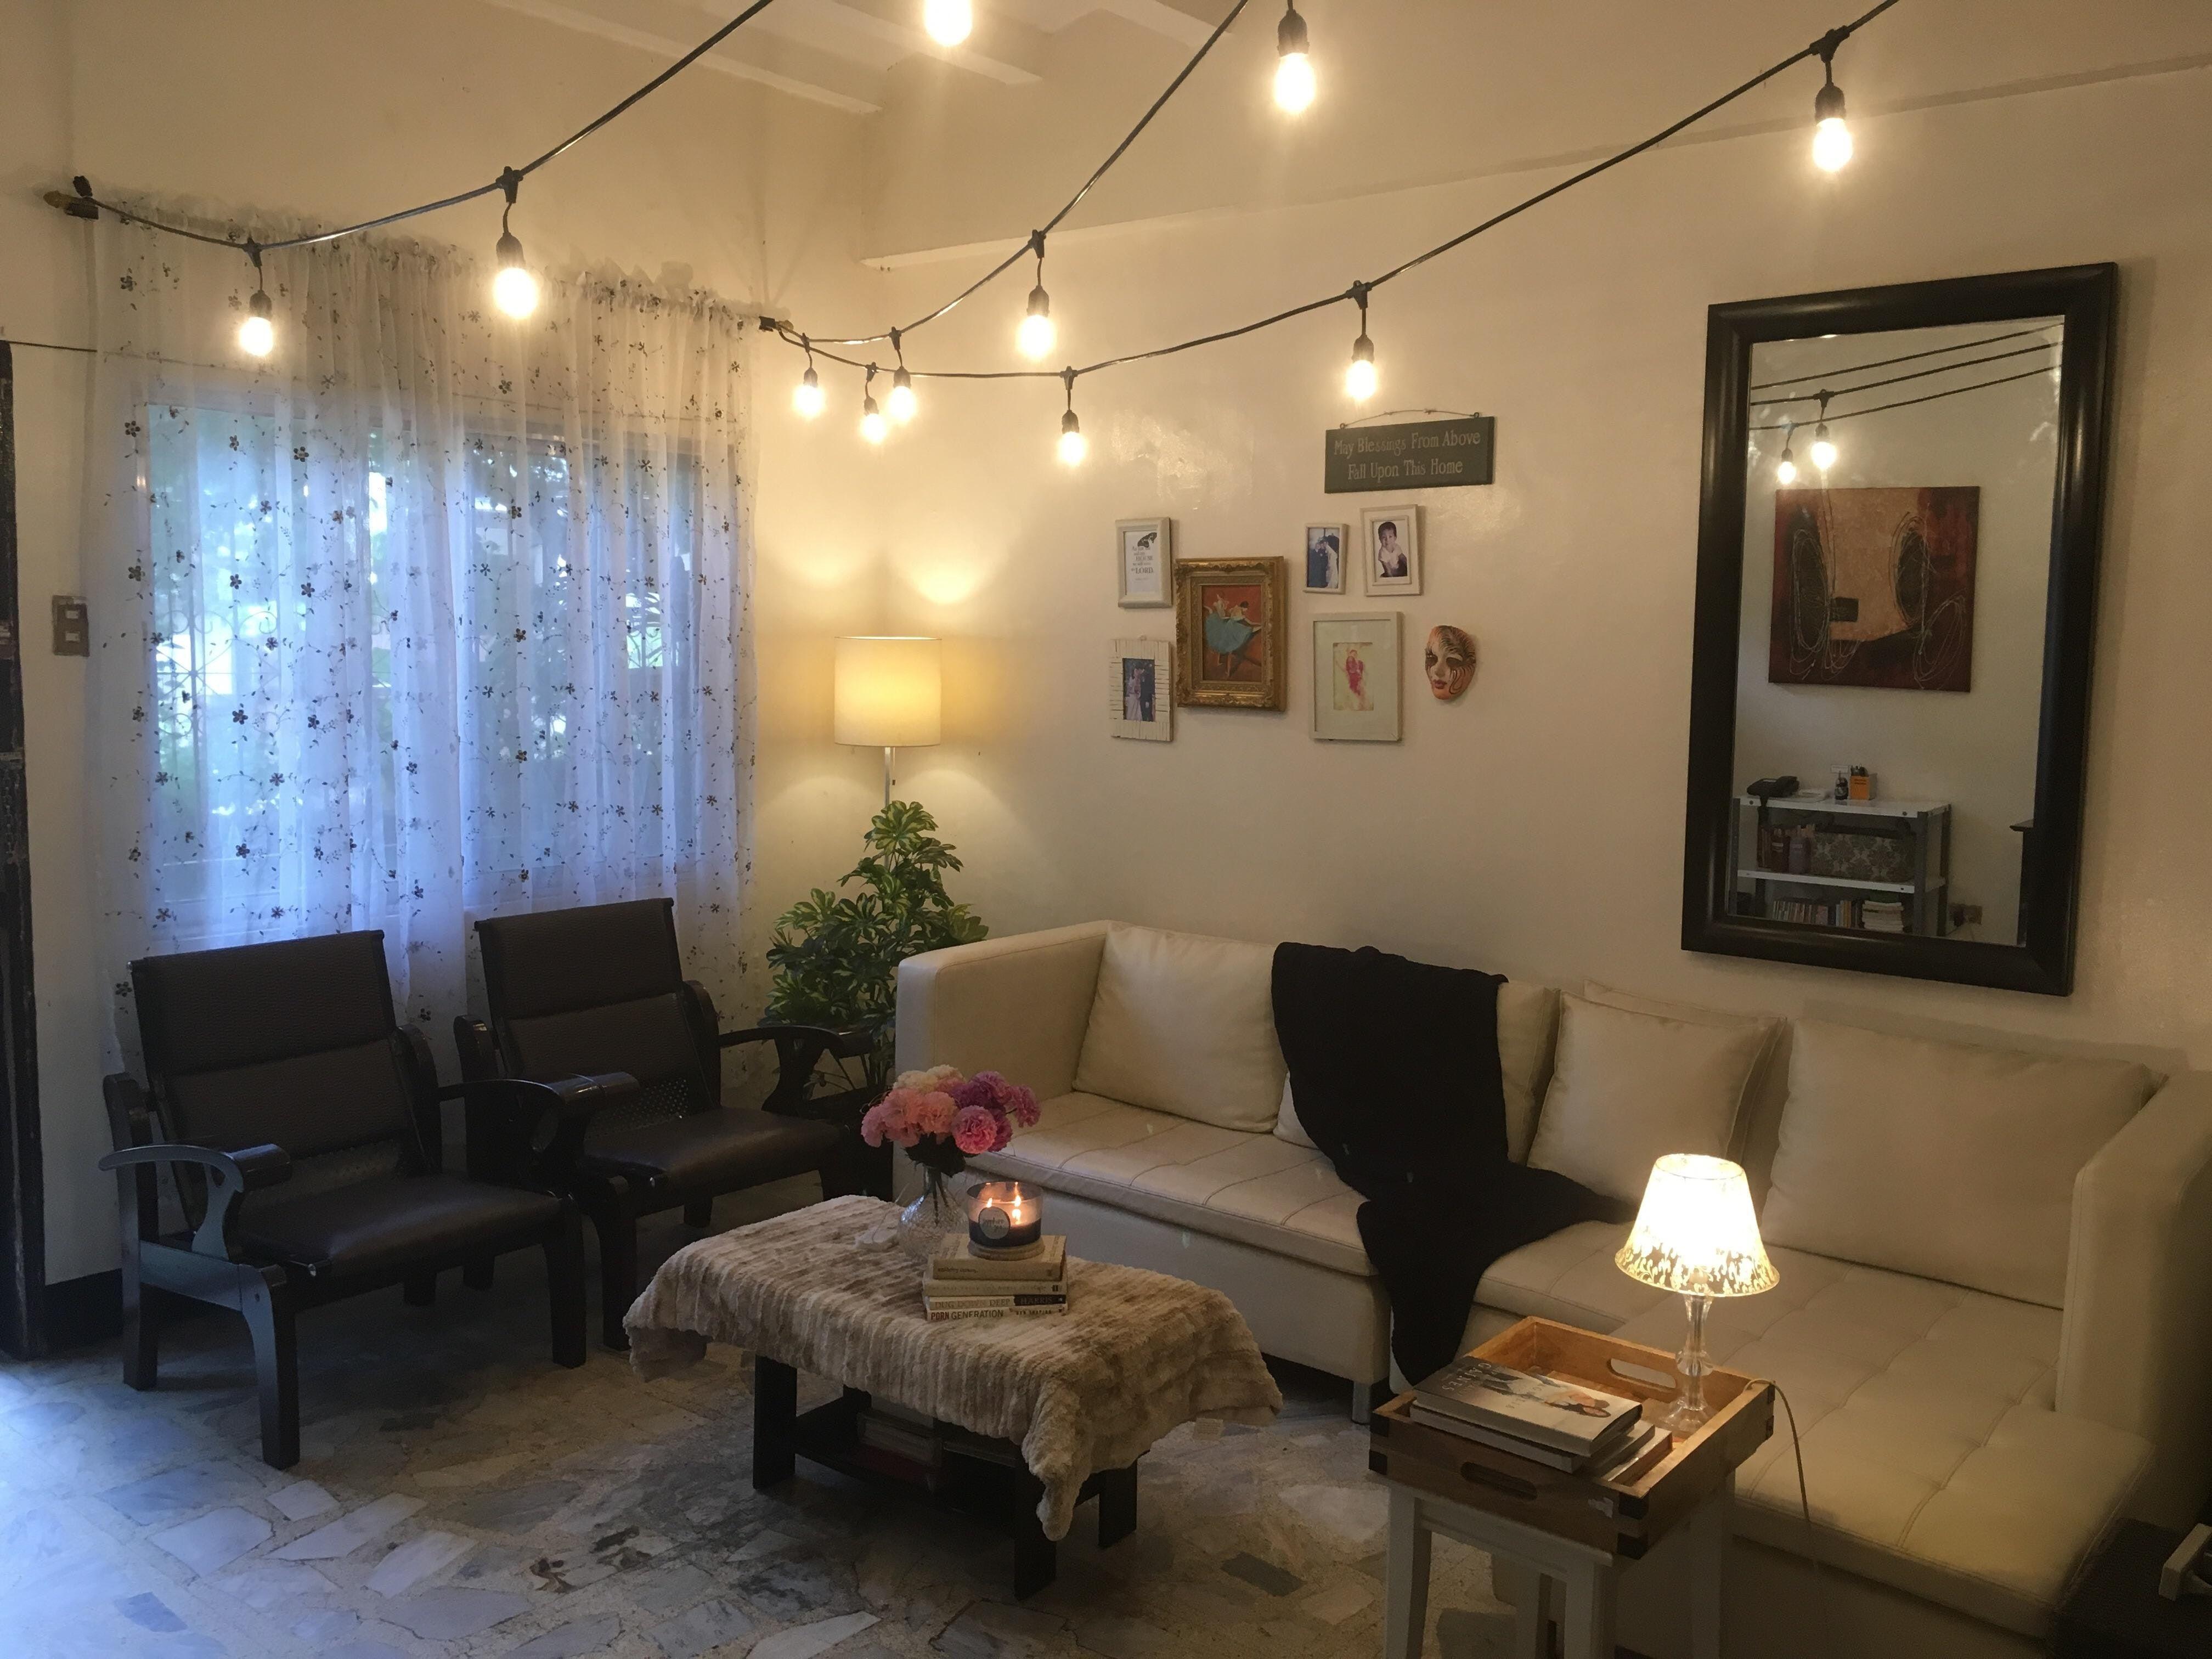 pin on interior home ideas modern on extraordinary living room ideas with lighting id=99553